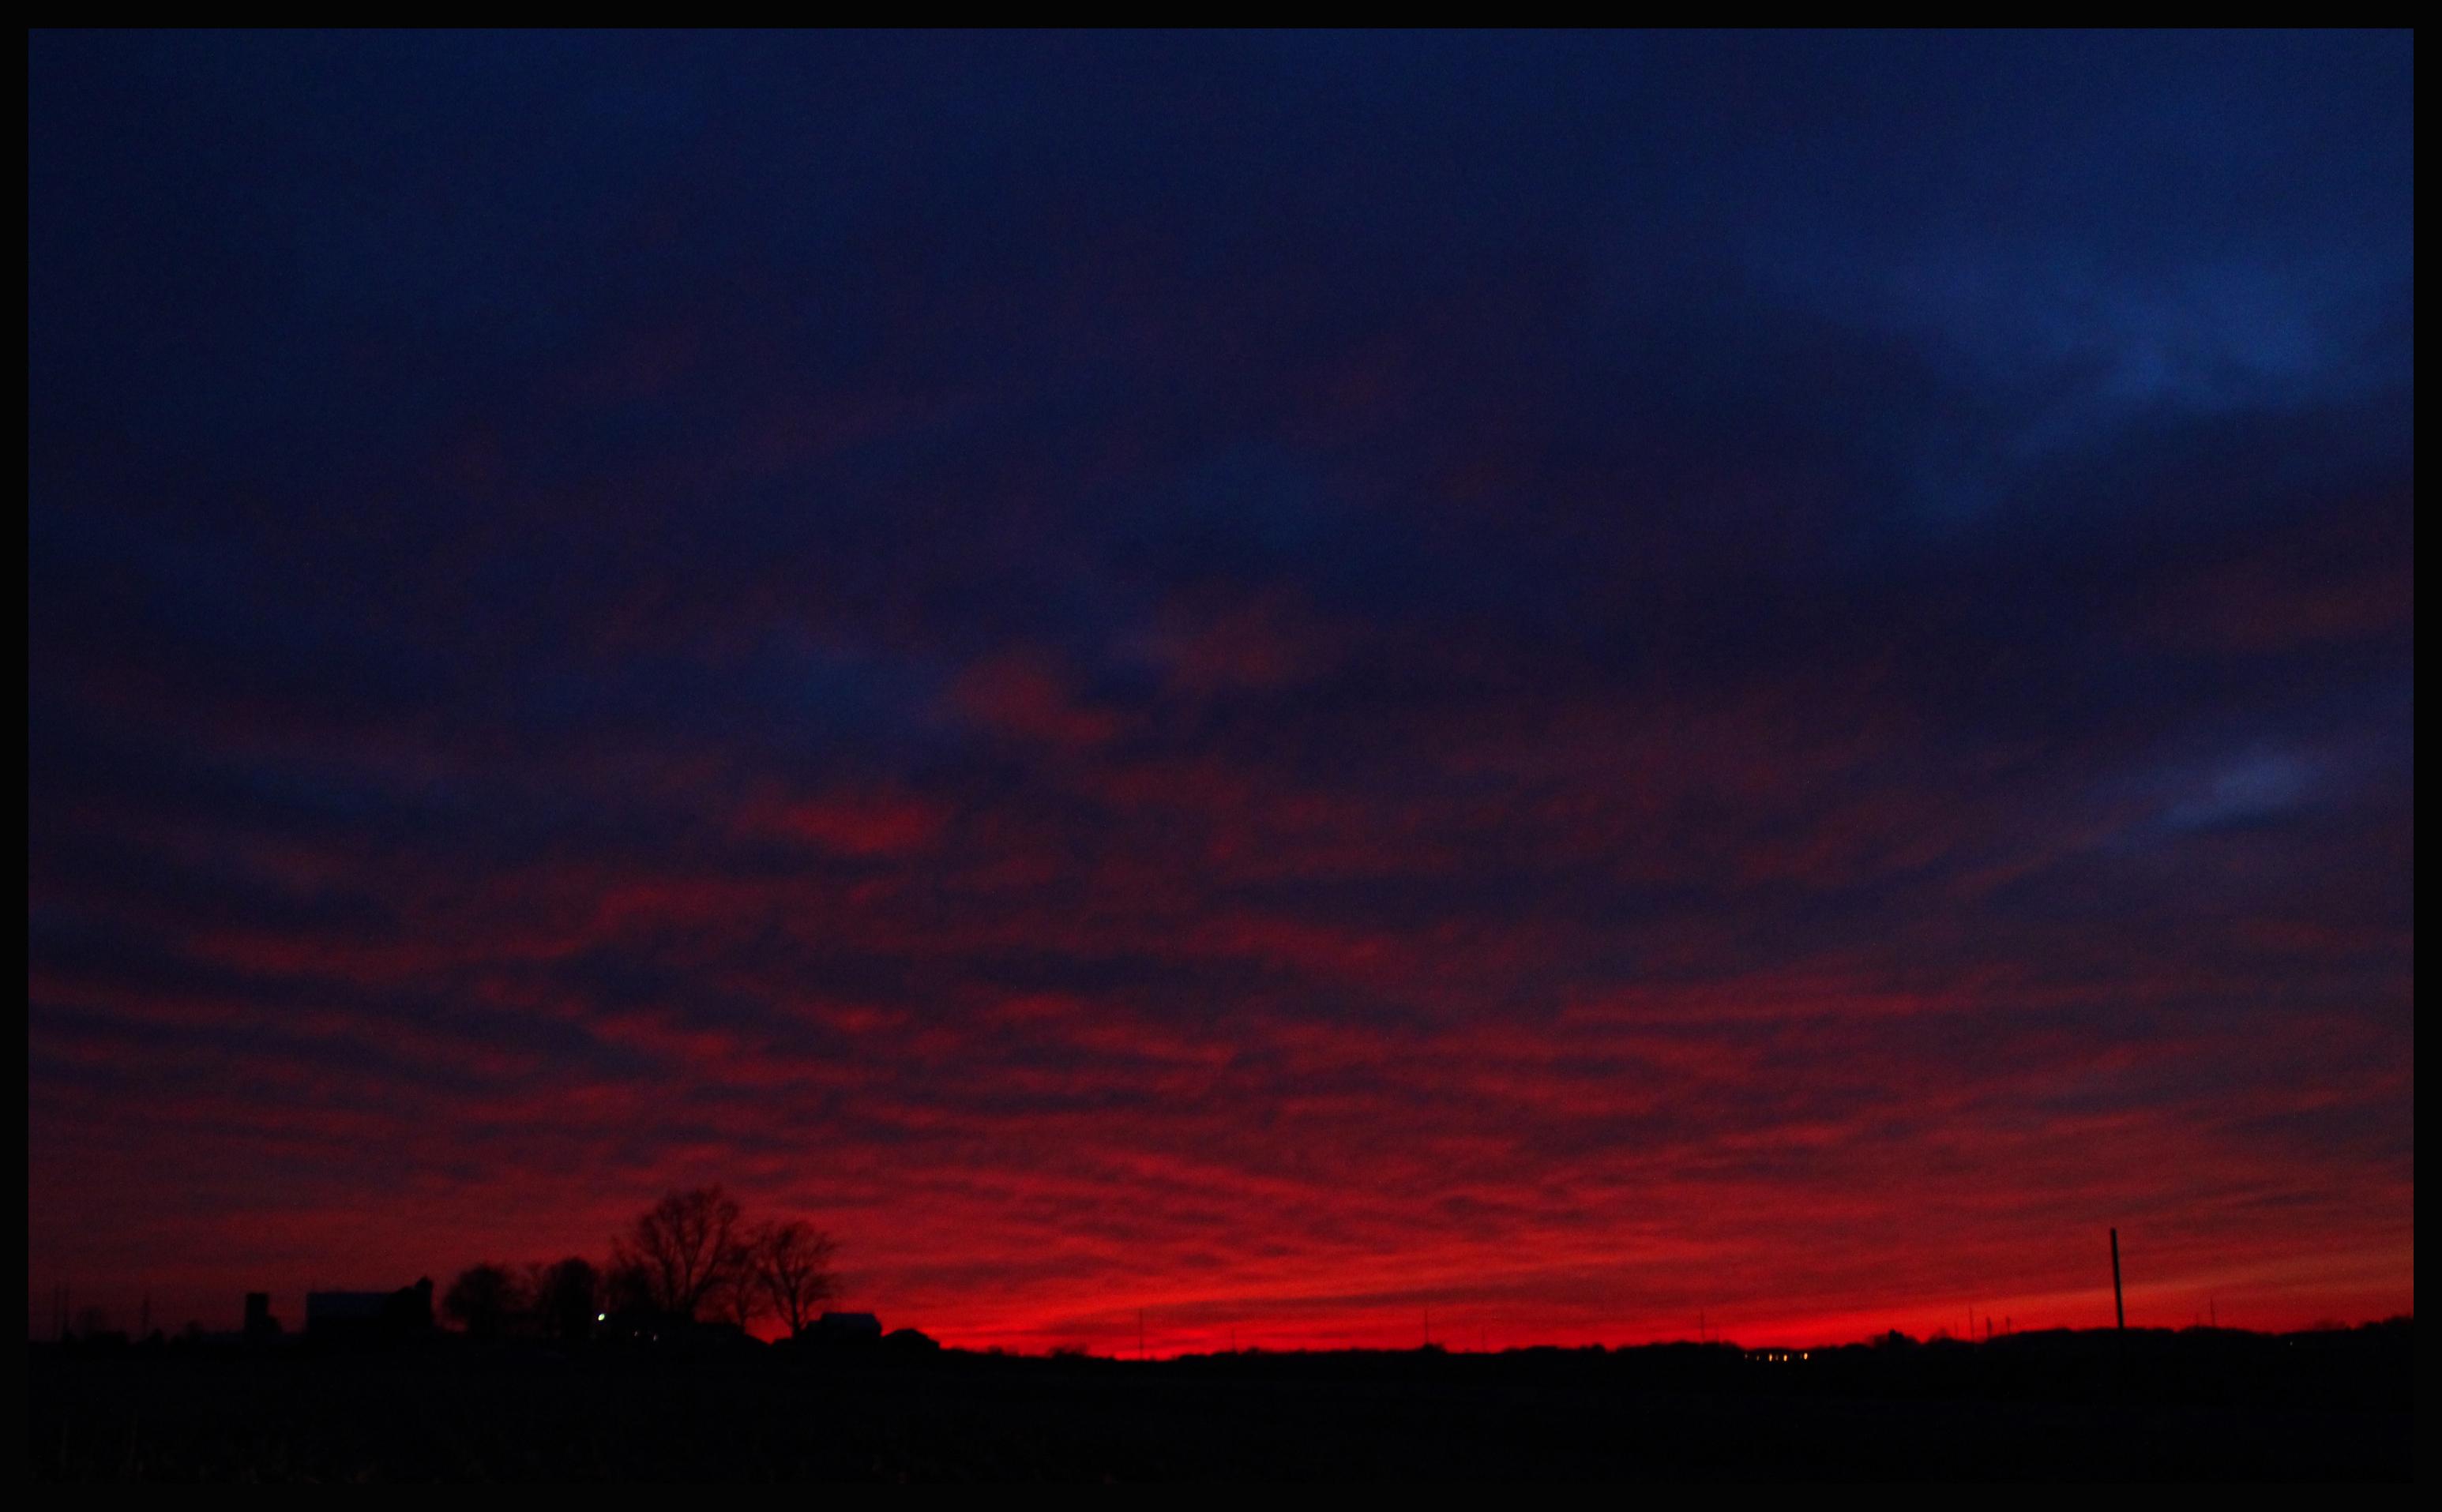 13 Beautiful Night Sky Wallpaper Collections   Yoanucom 3092x1915